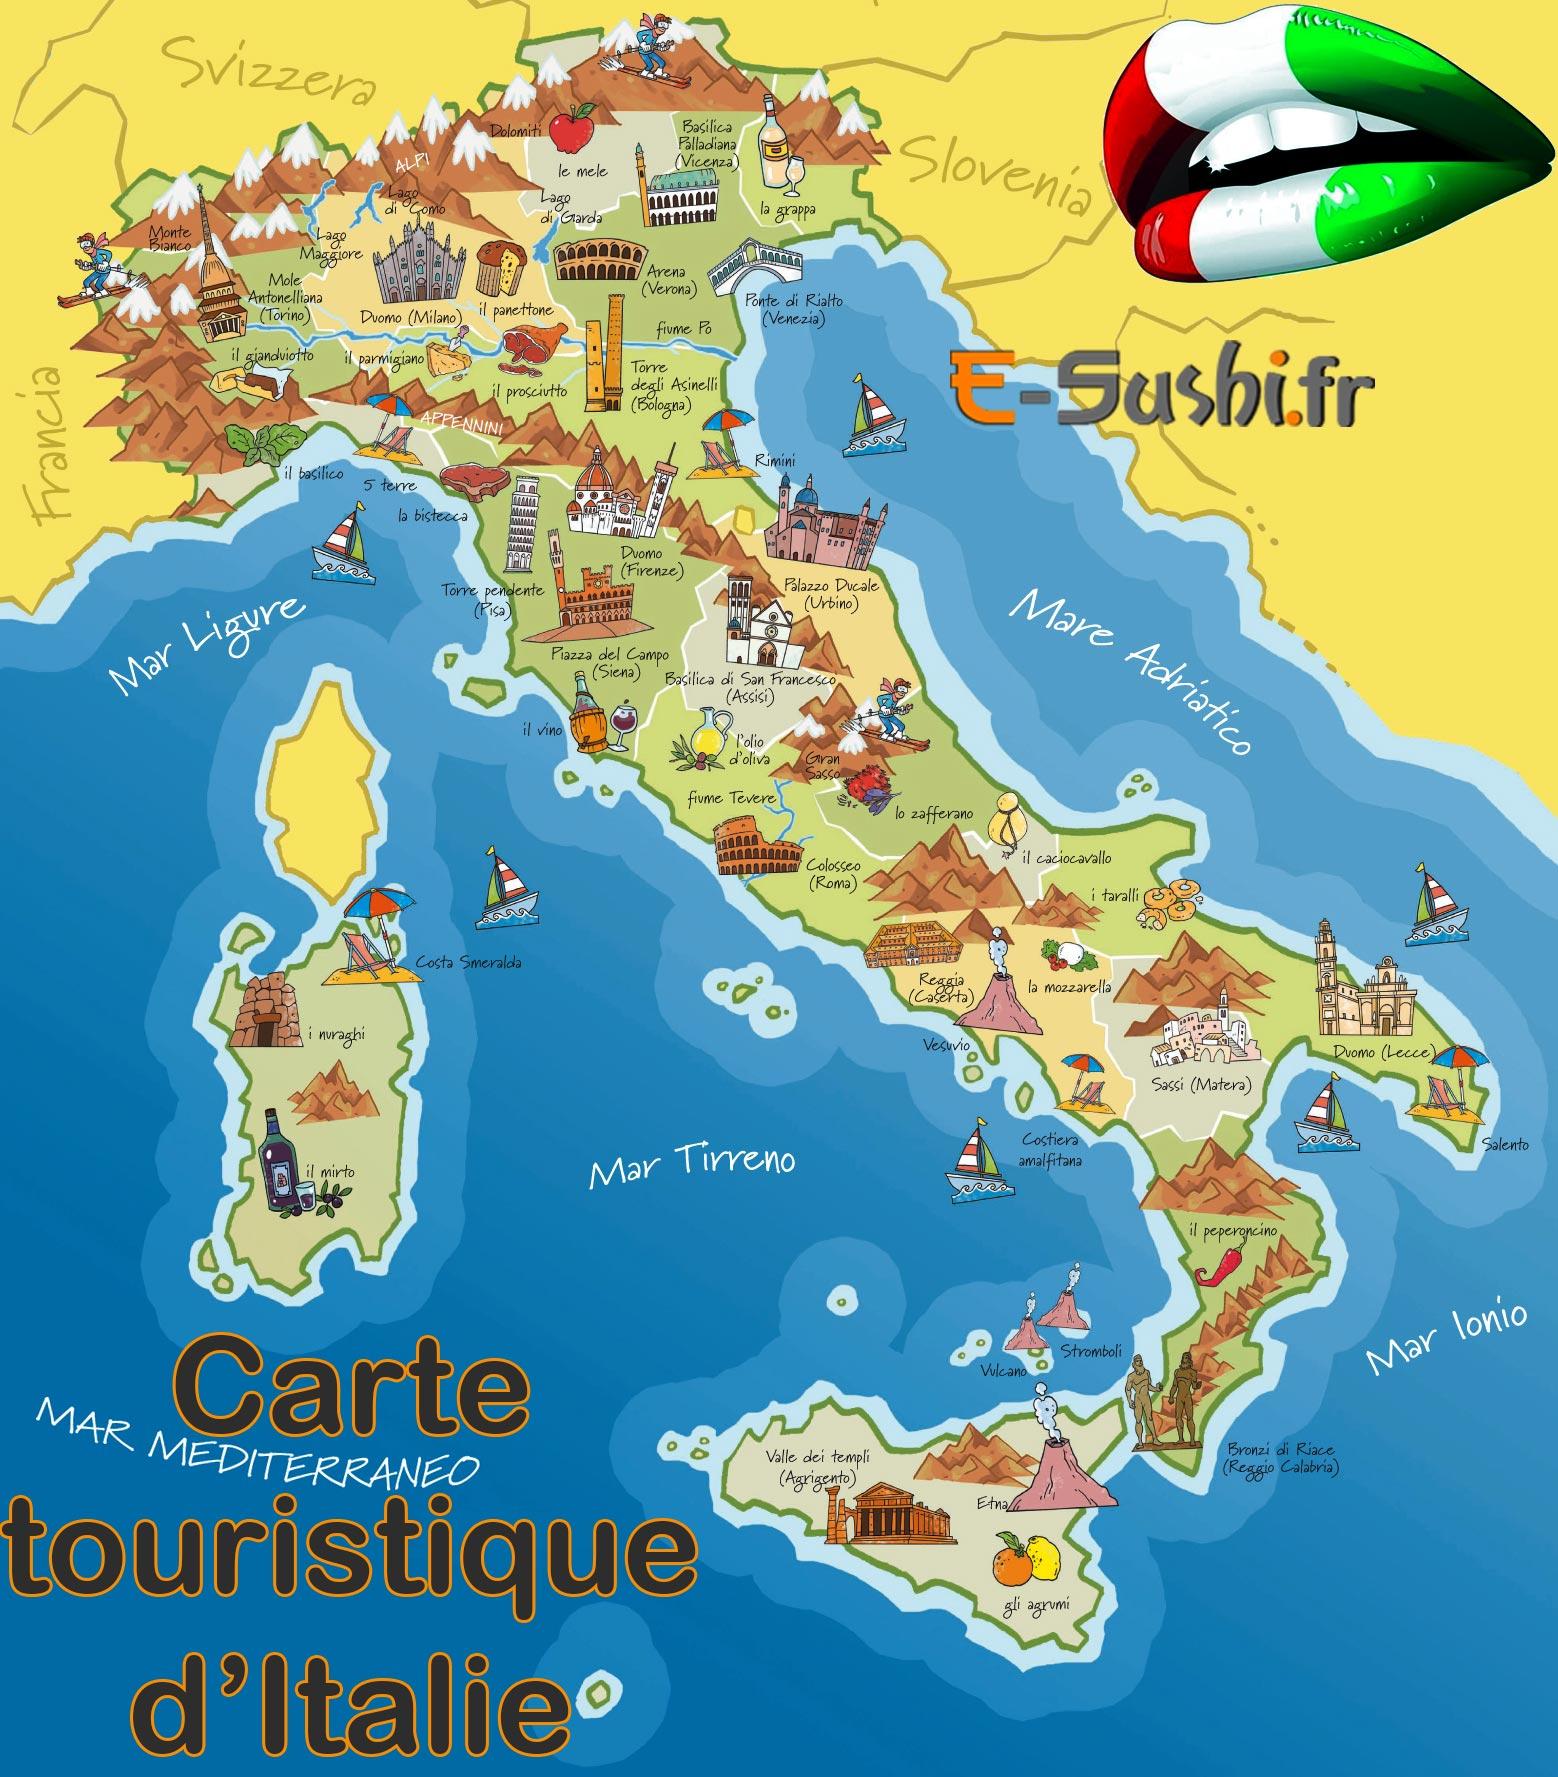 Sud italie tourisme vacances italiennes 2016 - Experience Voyage